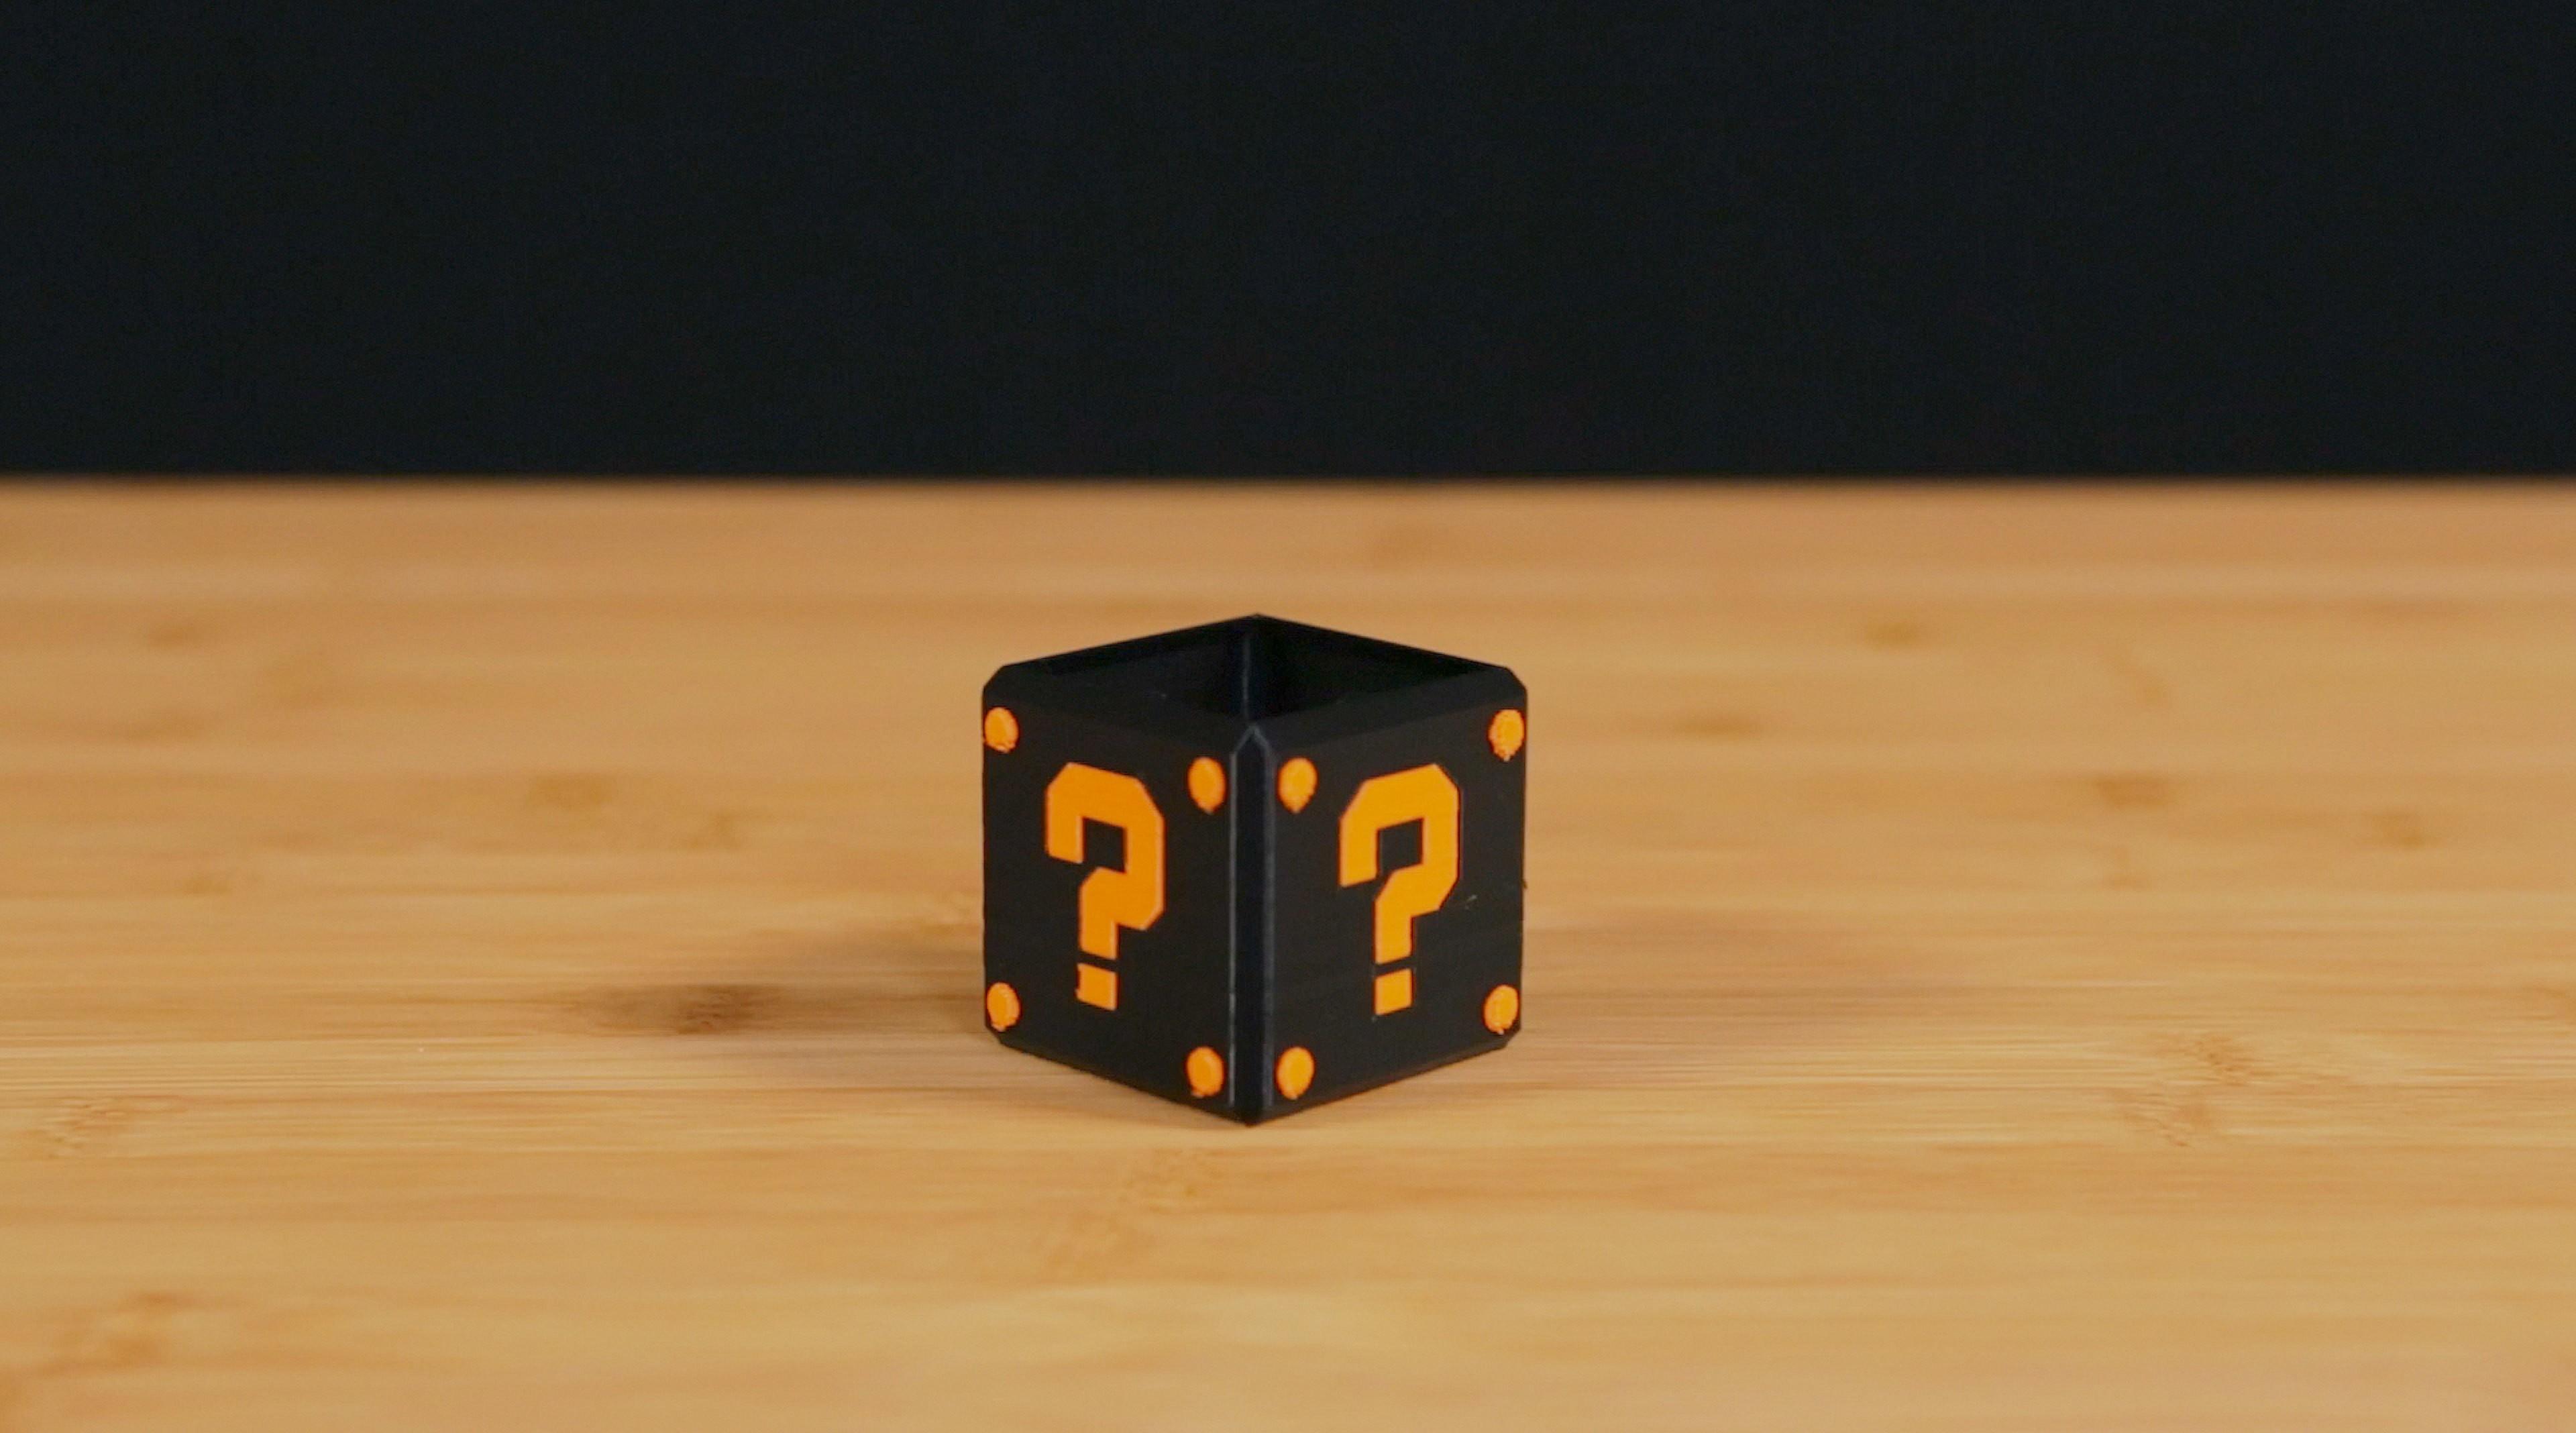 qbox-thumb2.jpg Download free STL file Dual Extrusion Question Block • 3D print template, Adafruit